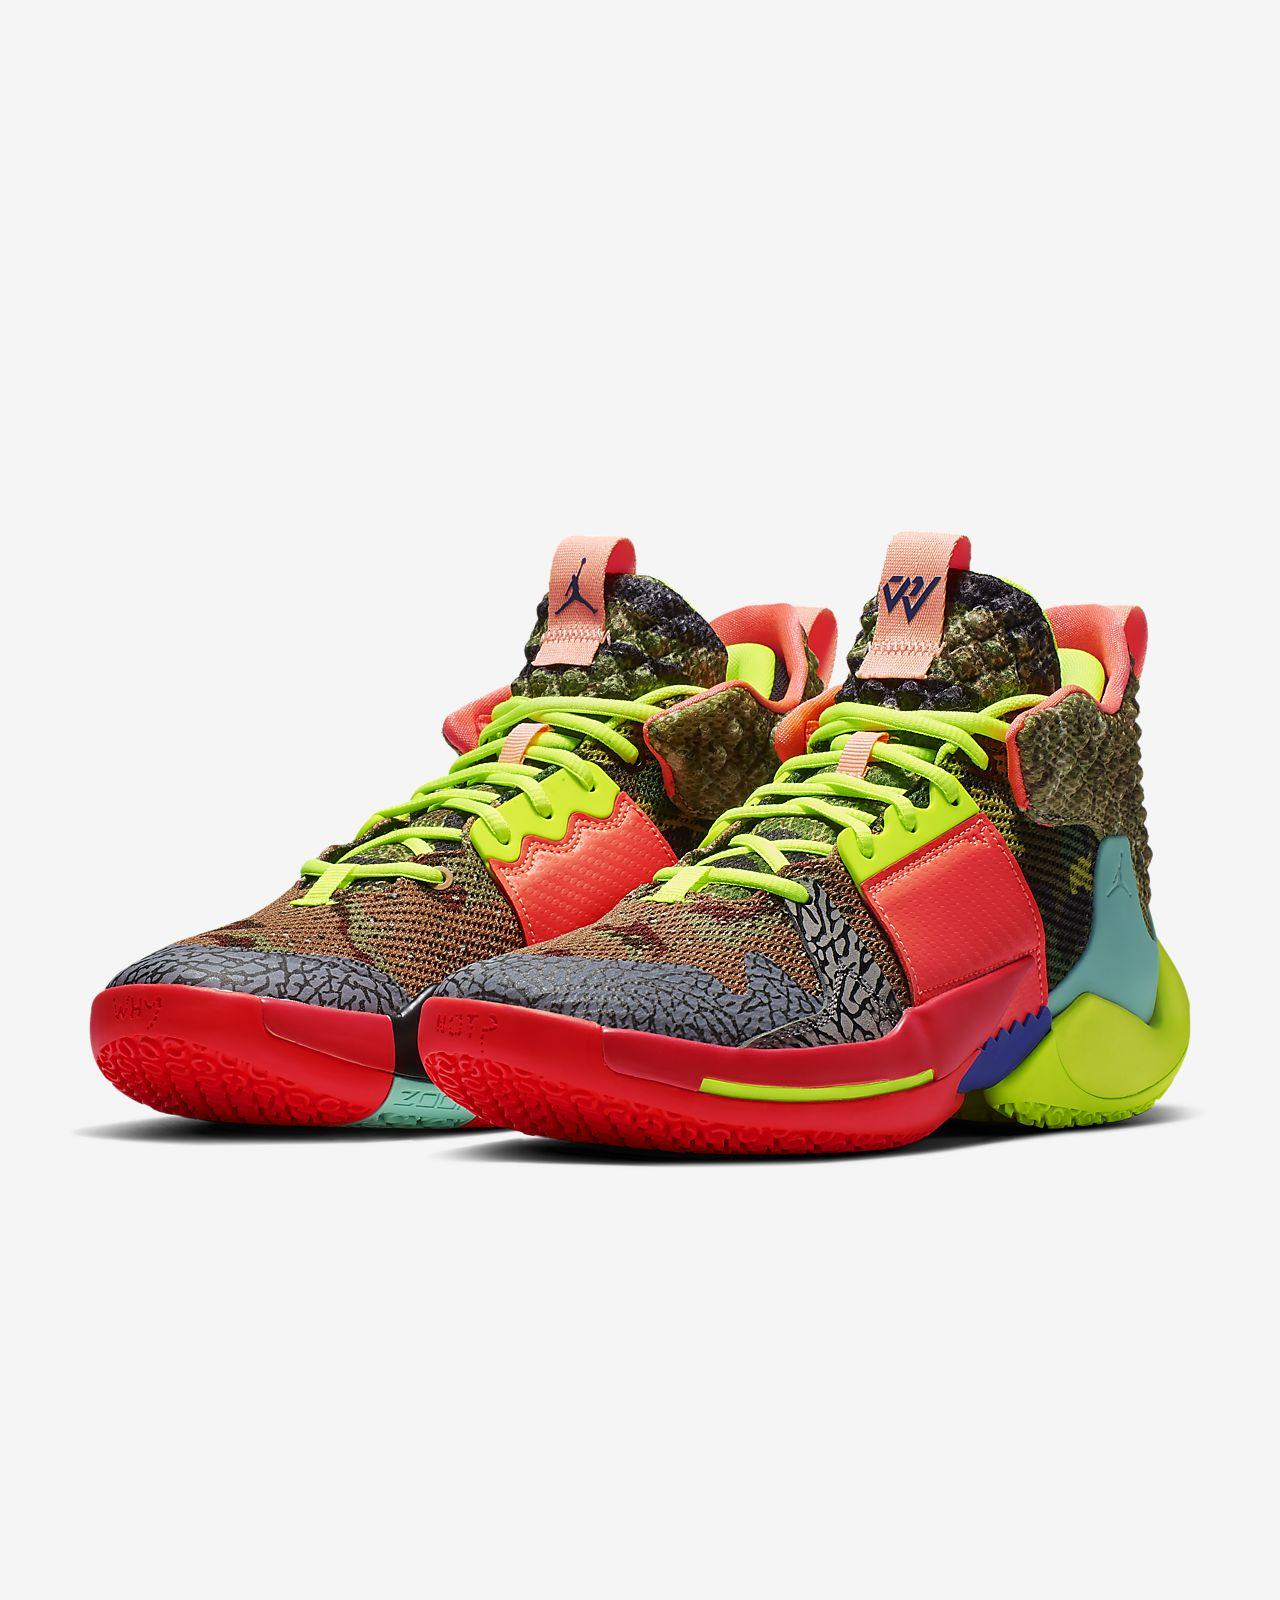 finest selection 0846b b5fd1 Zer0.2 SP Basketball Shoe Jordan